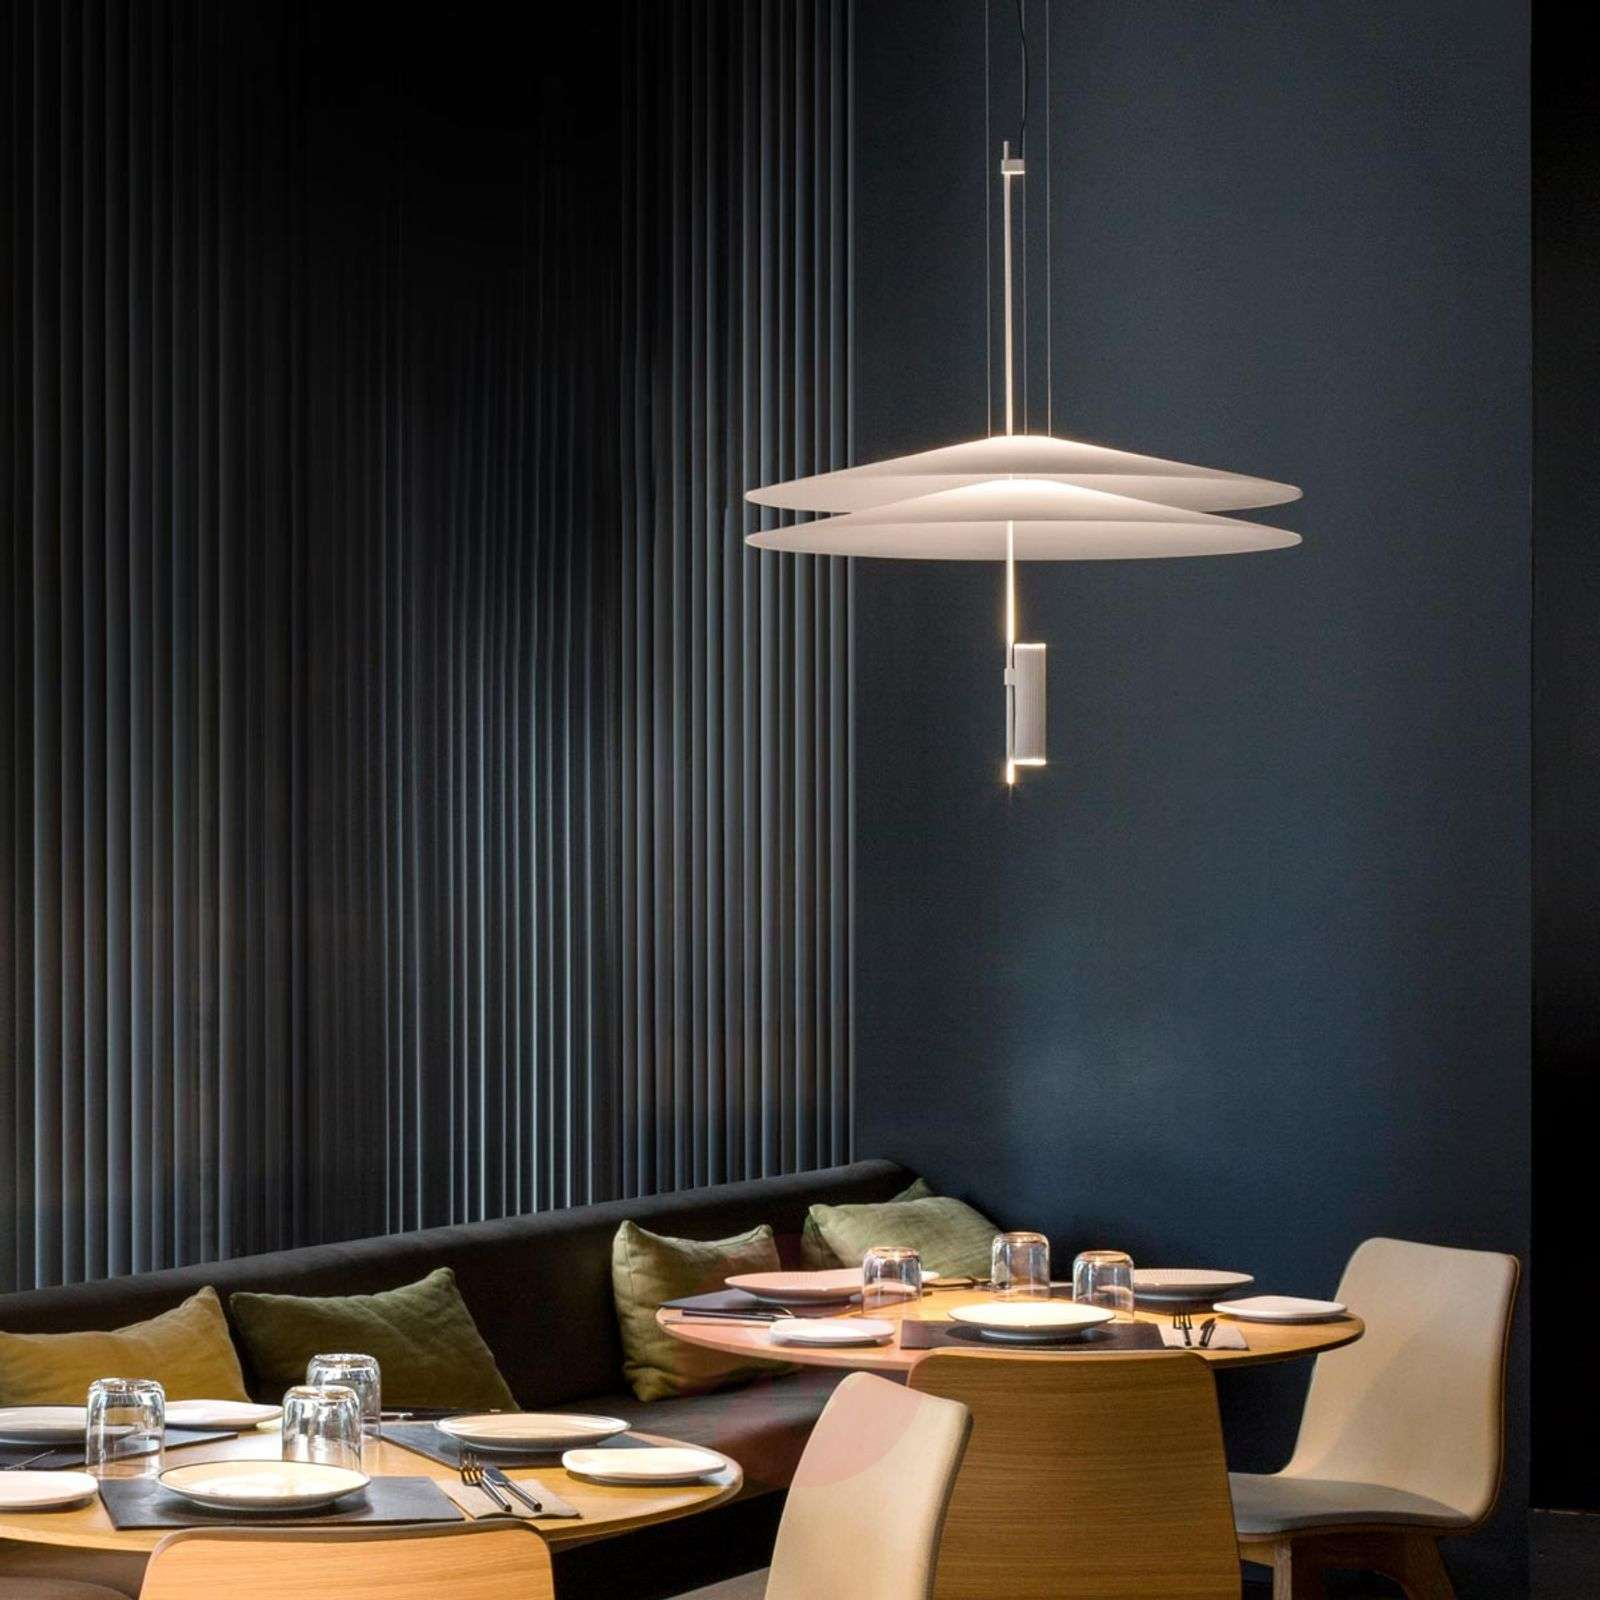 Designer-riippuvalaisin Flamingo LED-valolla-9515093-01